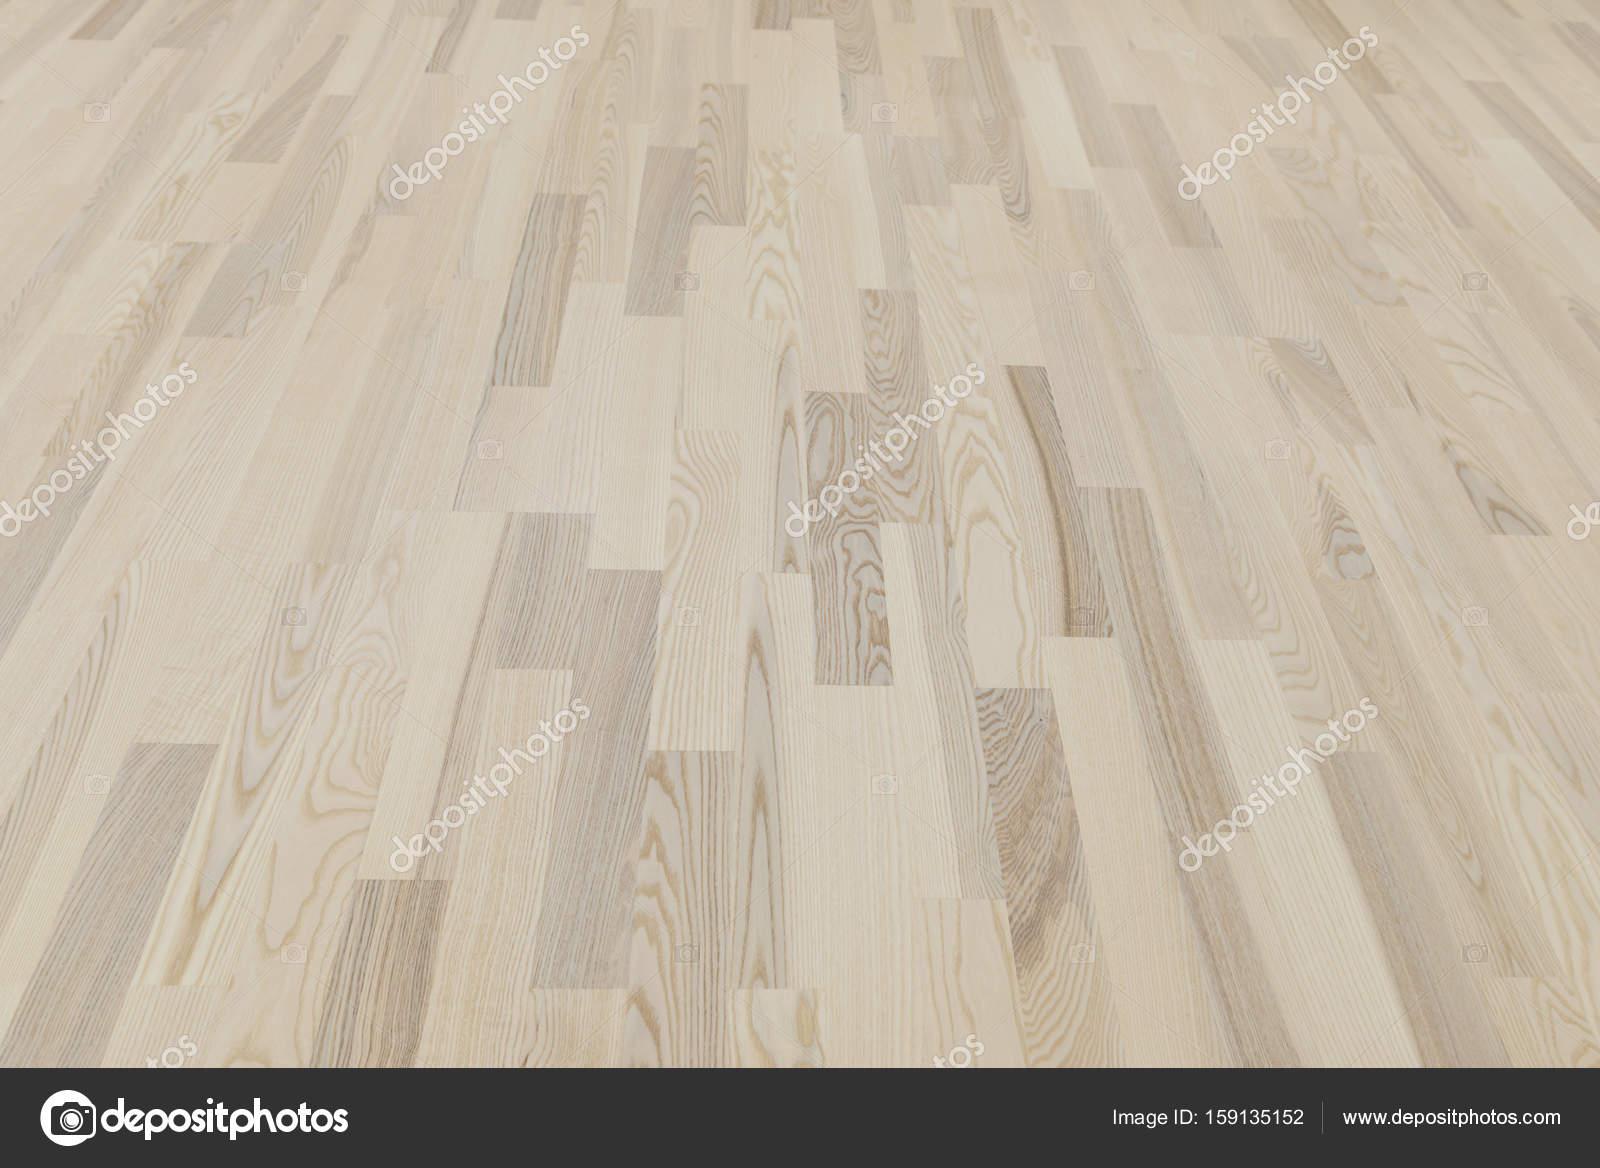 Parket vloer wit eiken textuur als achtergrond u2014 stockfoto © lenatru